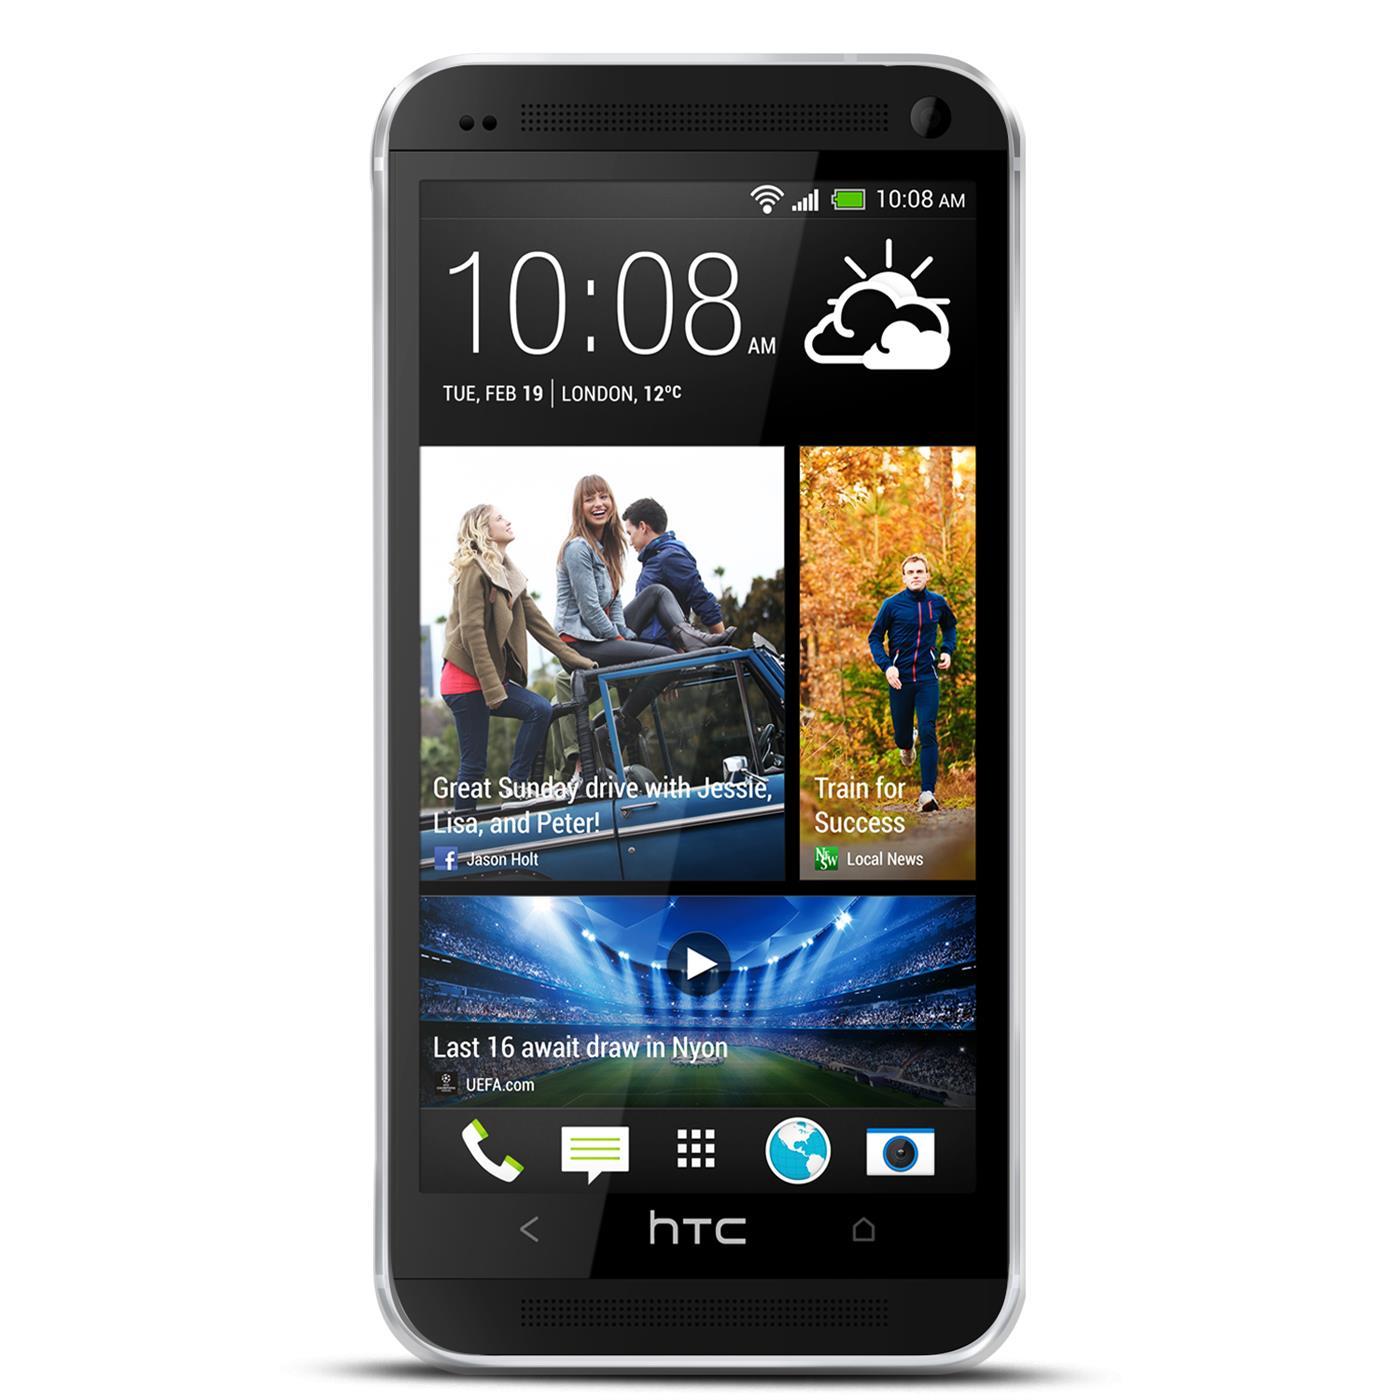 HTC-One-m9-Silikon-Gel-S-Line-Case-Cover-Ultra-Thin-Slim-Back-Bumper Indexbild 25